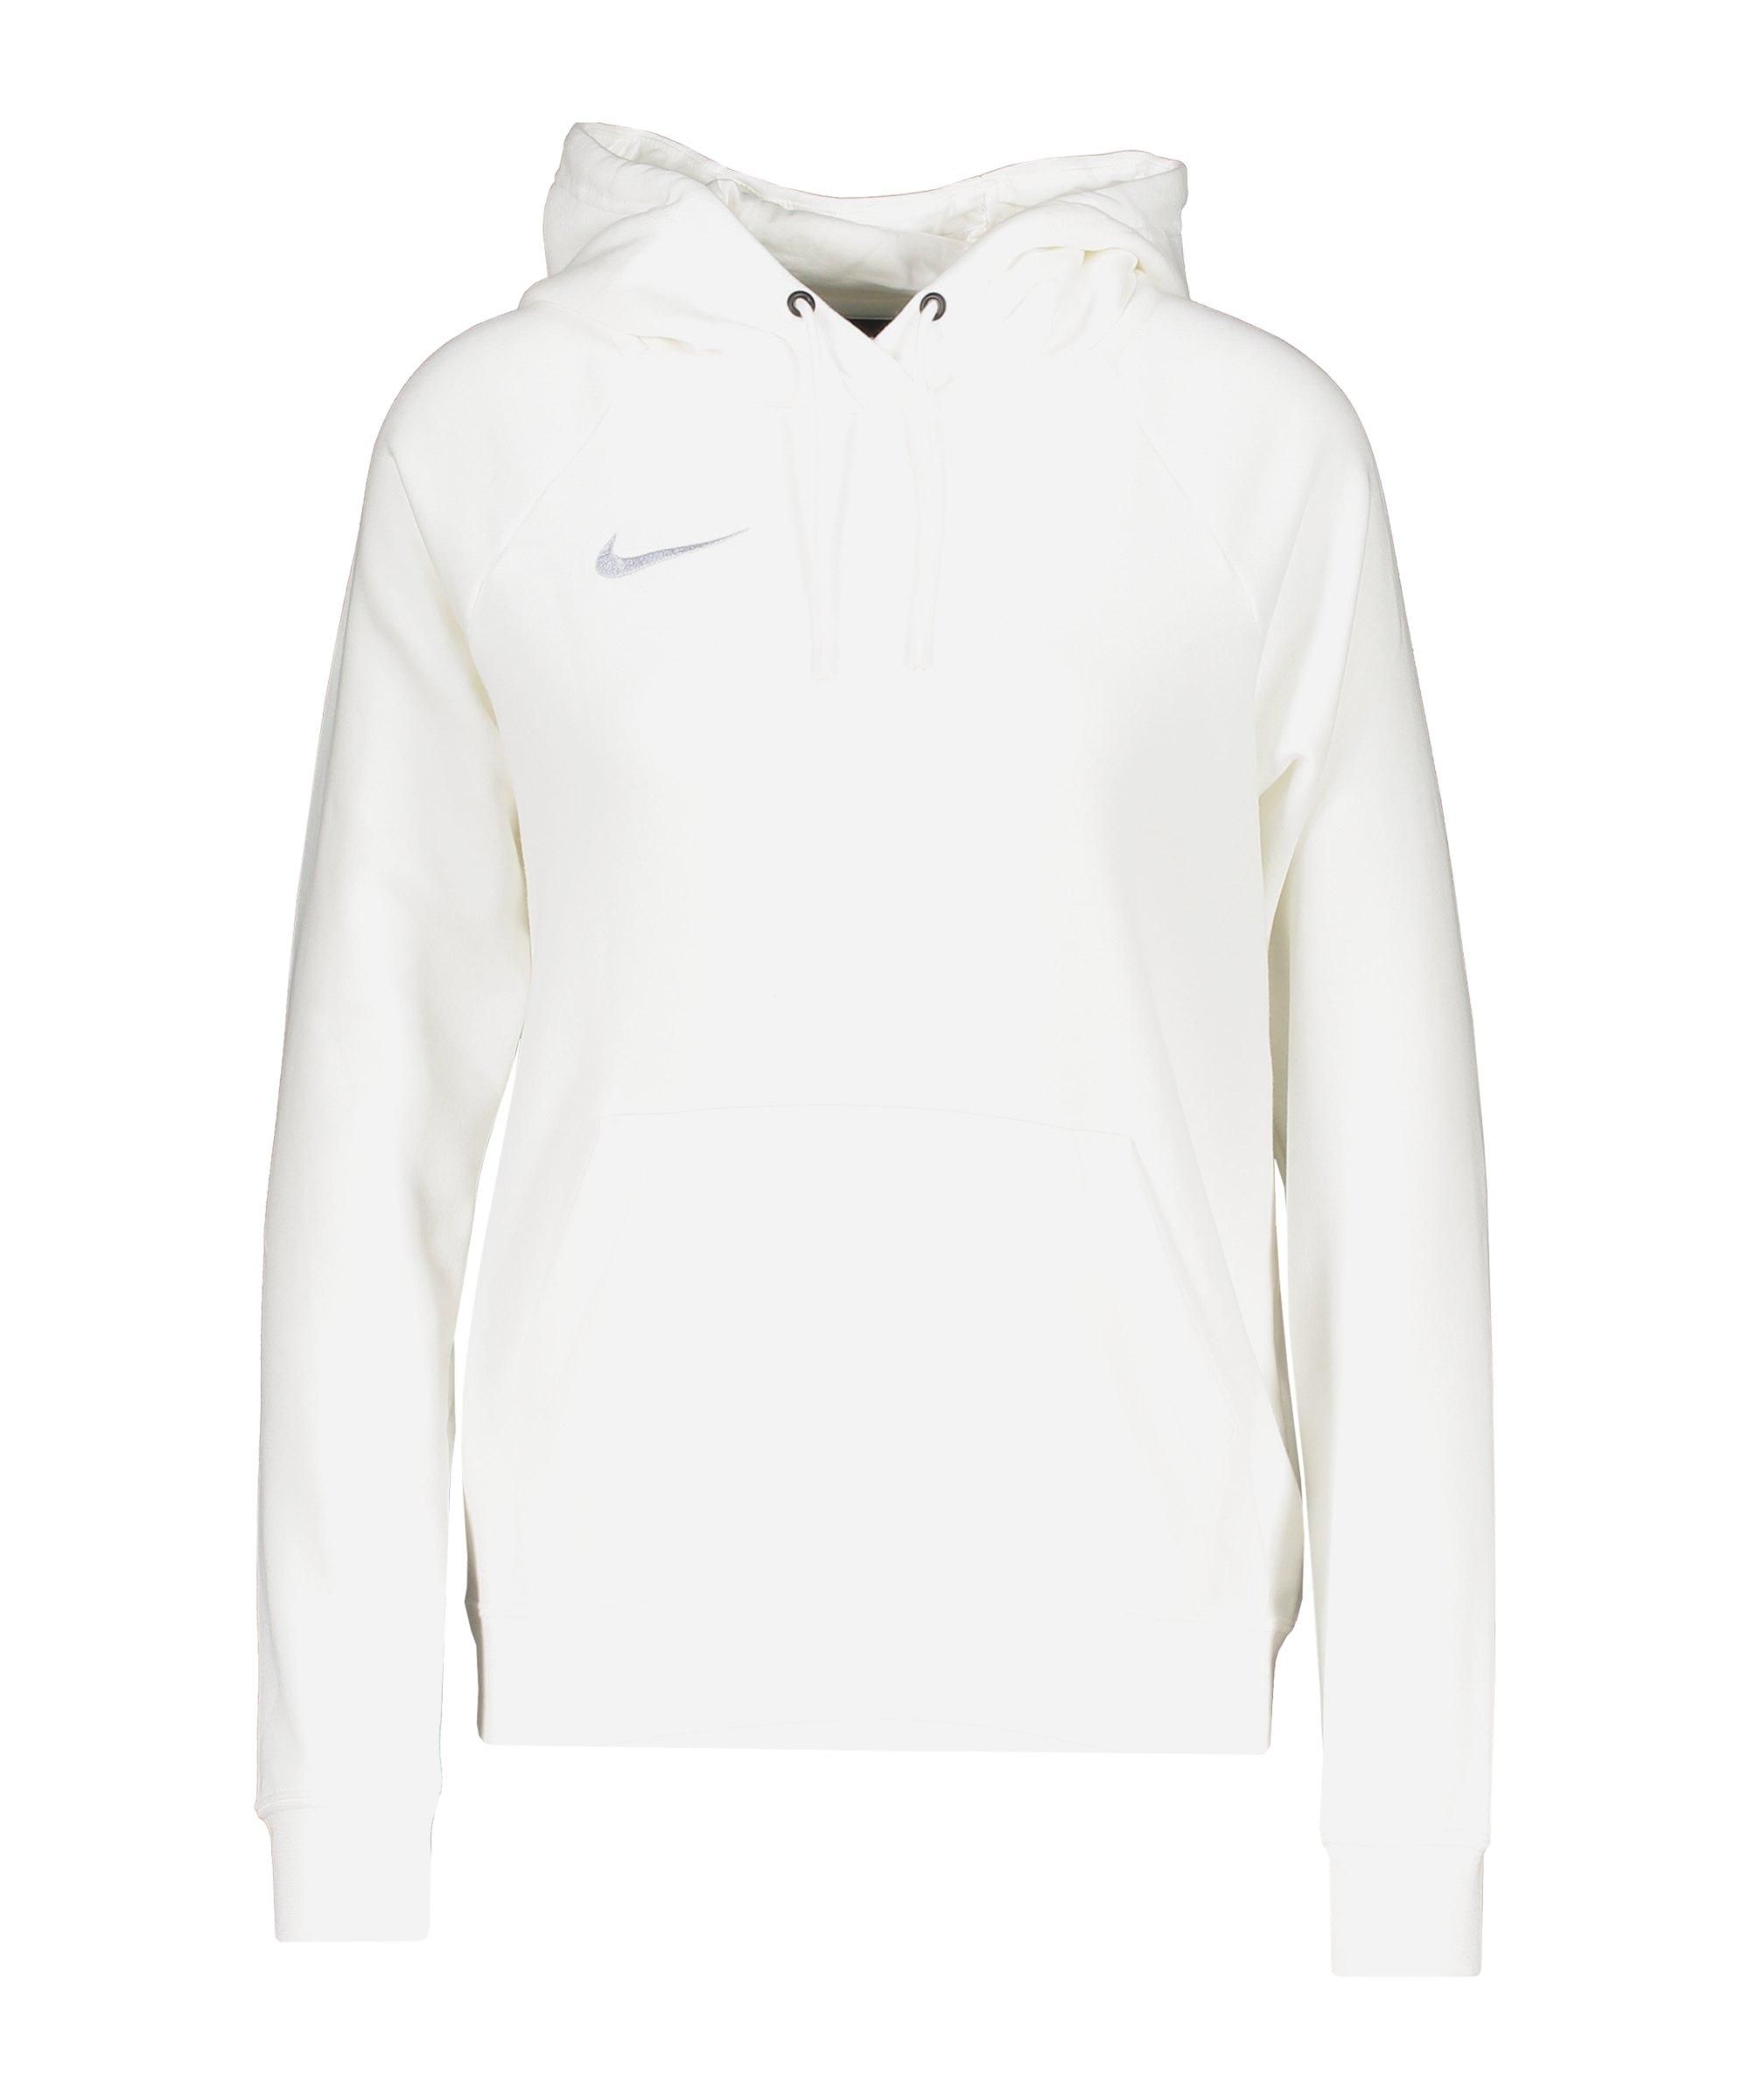 Nike Park 20 Fleece Hoody Damen Weiss F101 - weiss